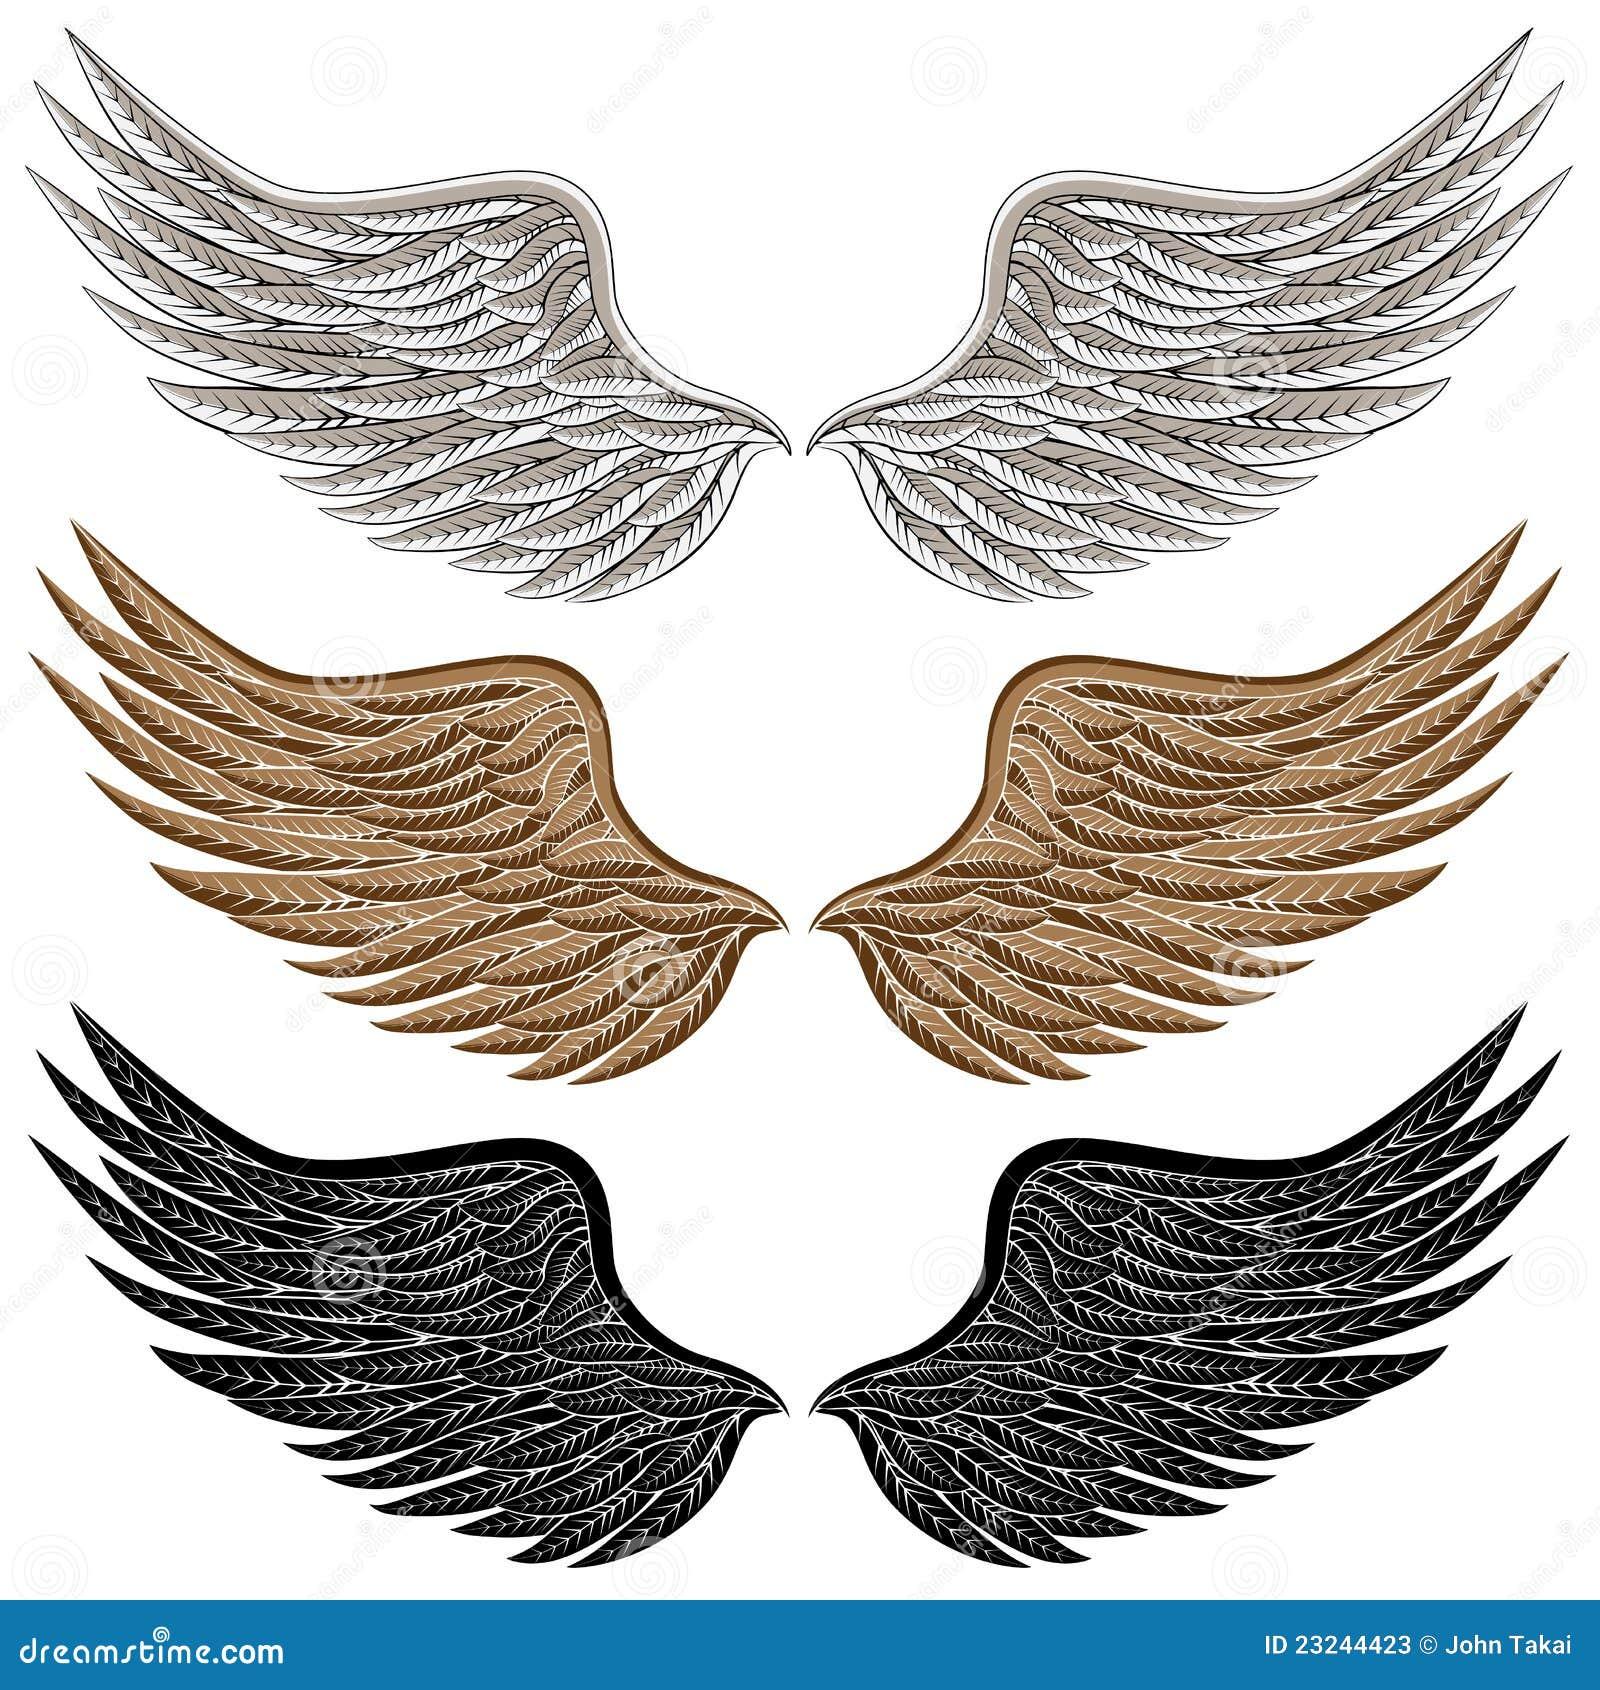 Detailed Bird Wings Stock Photos - Image: 23244423